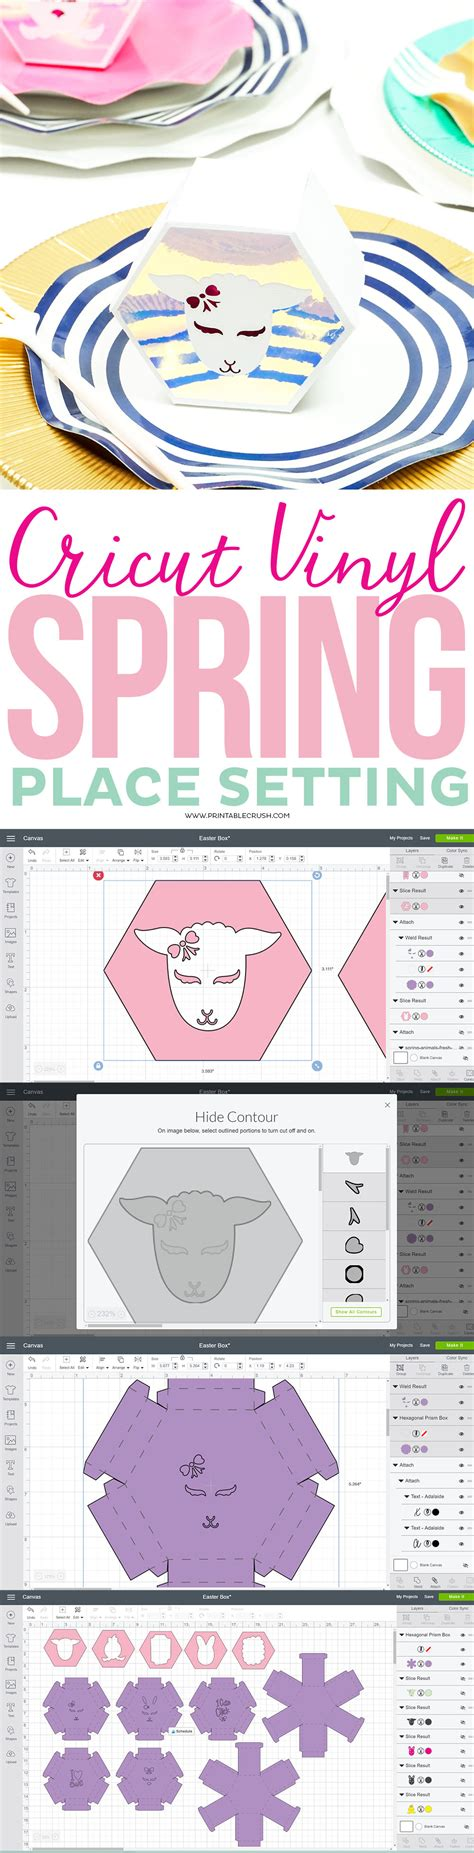 cricut printable vinyl tutorial gorgeous cricut vinyl spring place setting printable crush